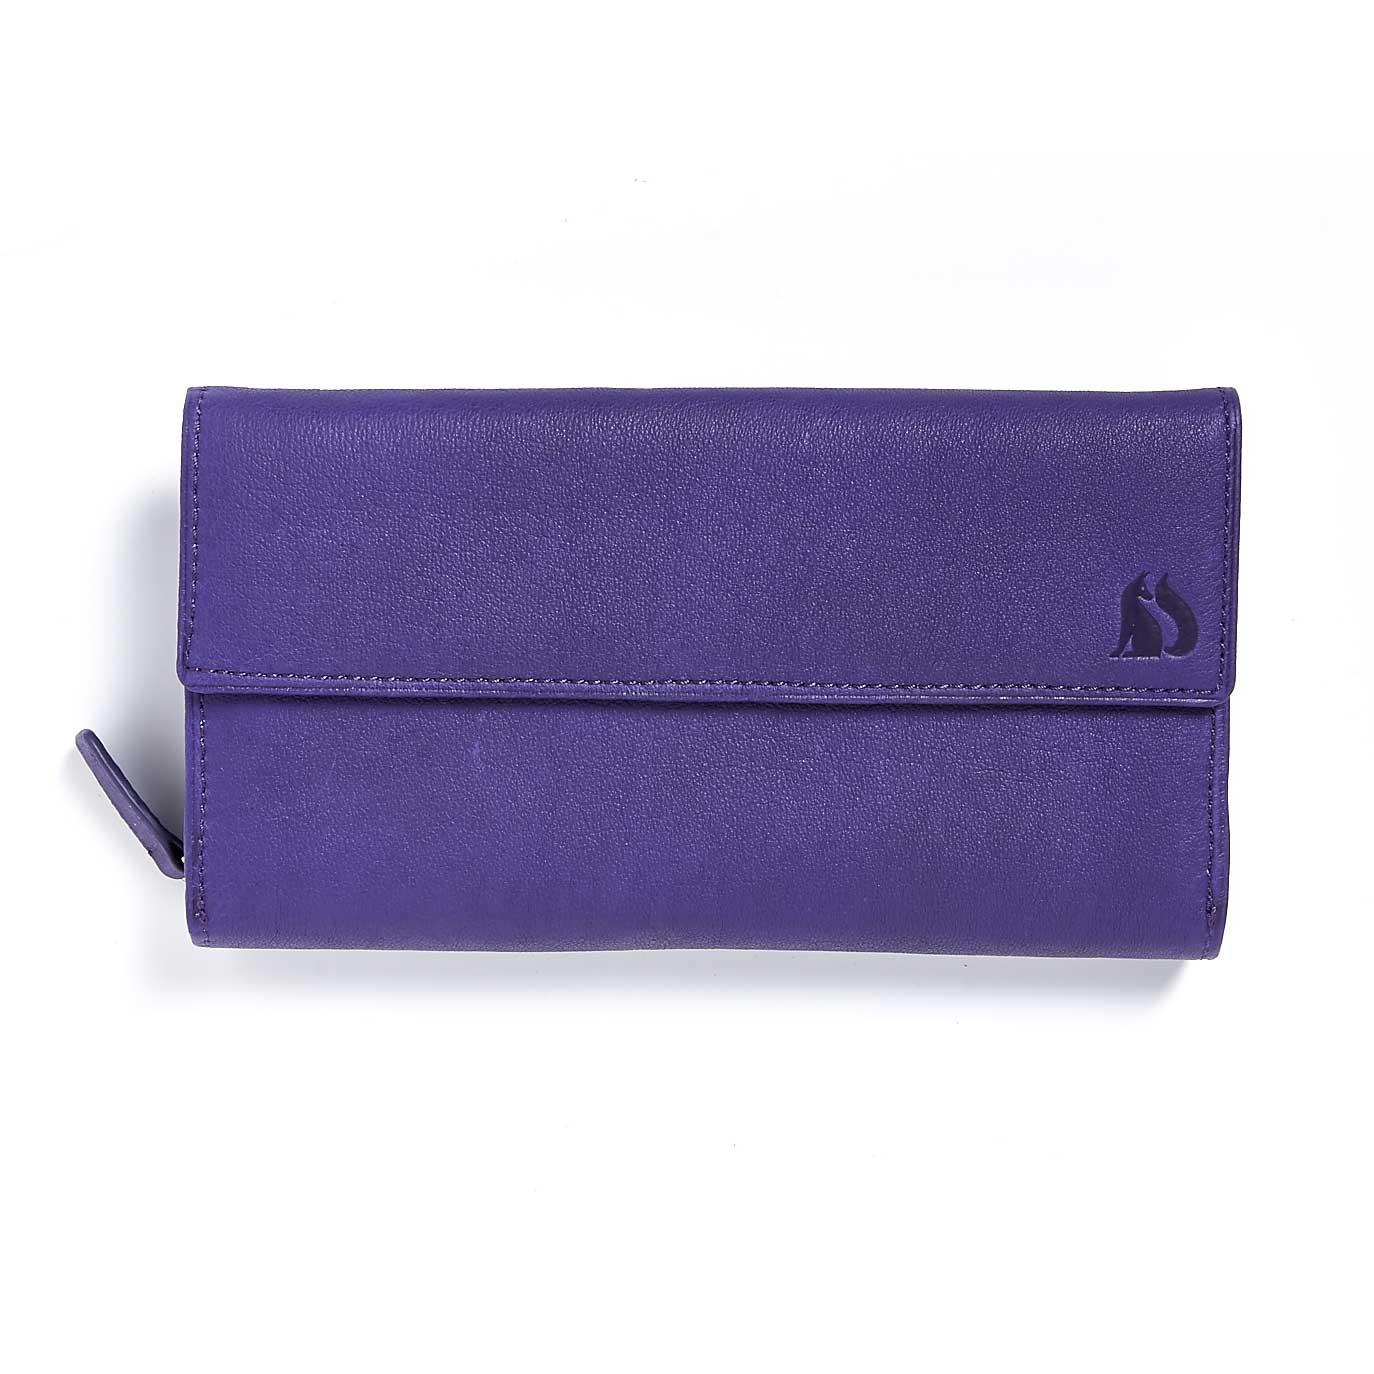 grizedale-foxfield-damson-leather-purse